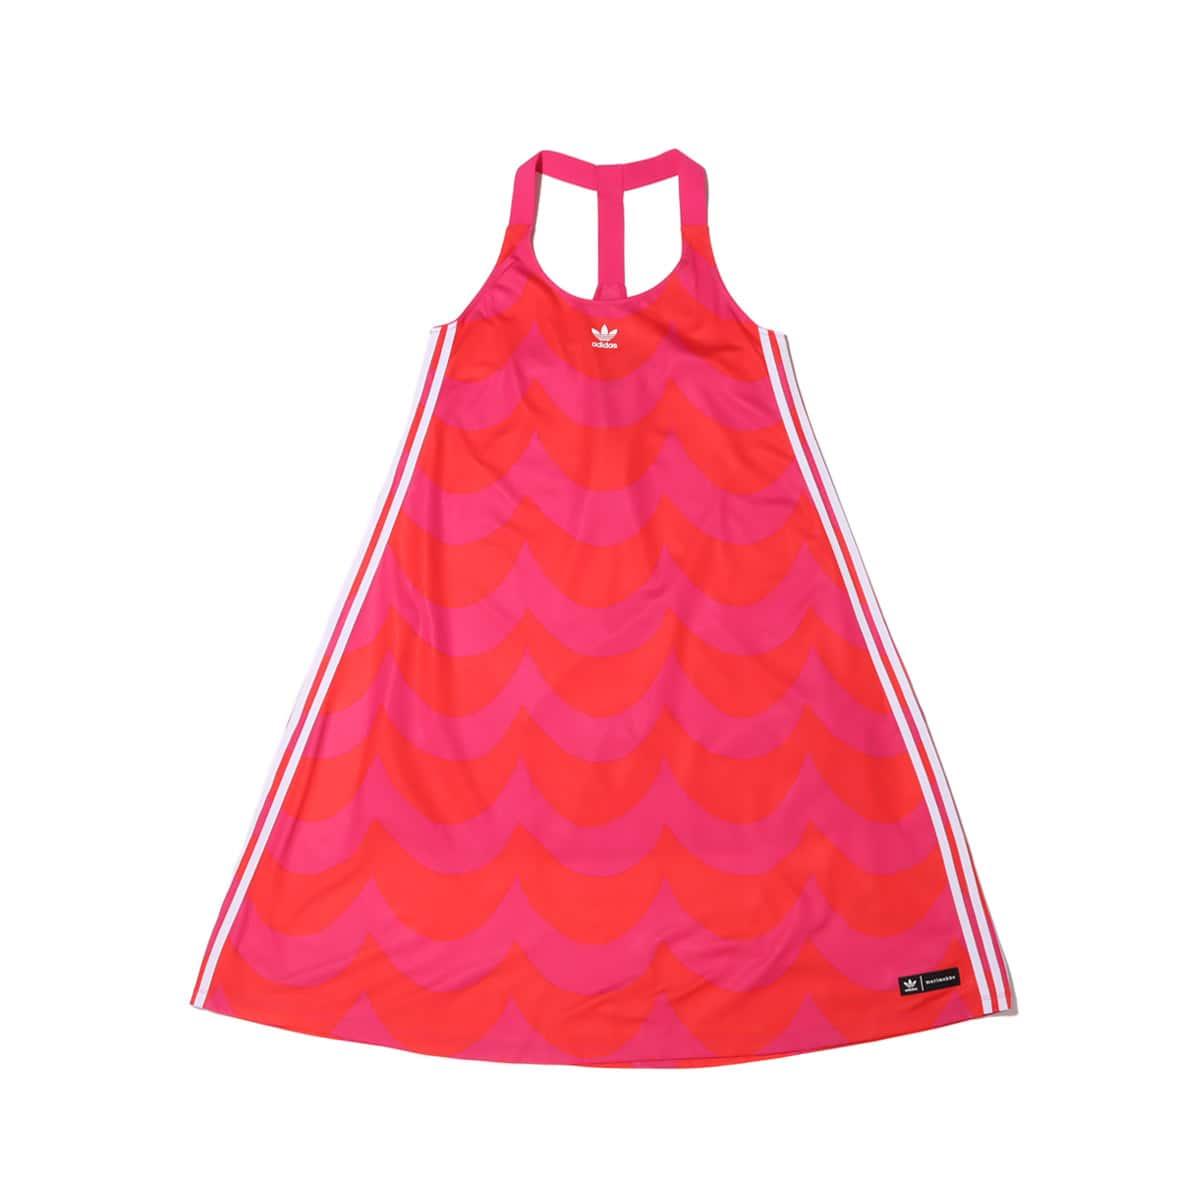 adidas Marimekko TANK DRESS VIVID RED/TEAM REAL MAGENTA 21FW-S_photo_large